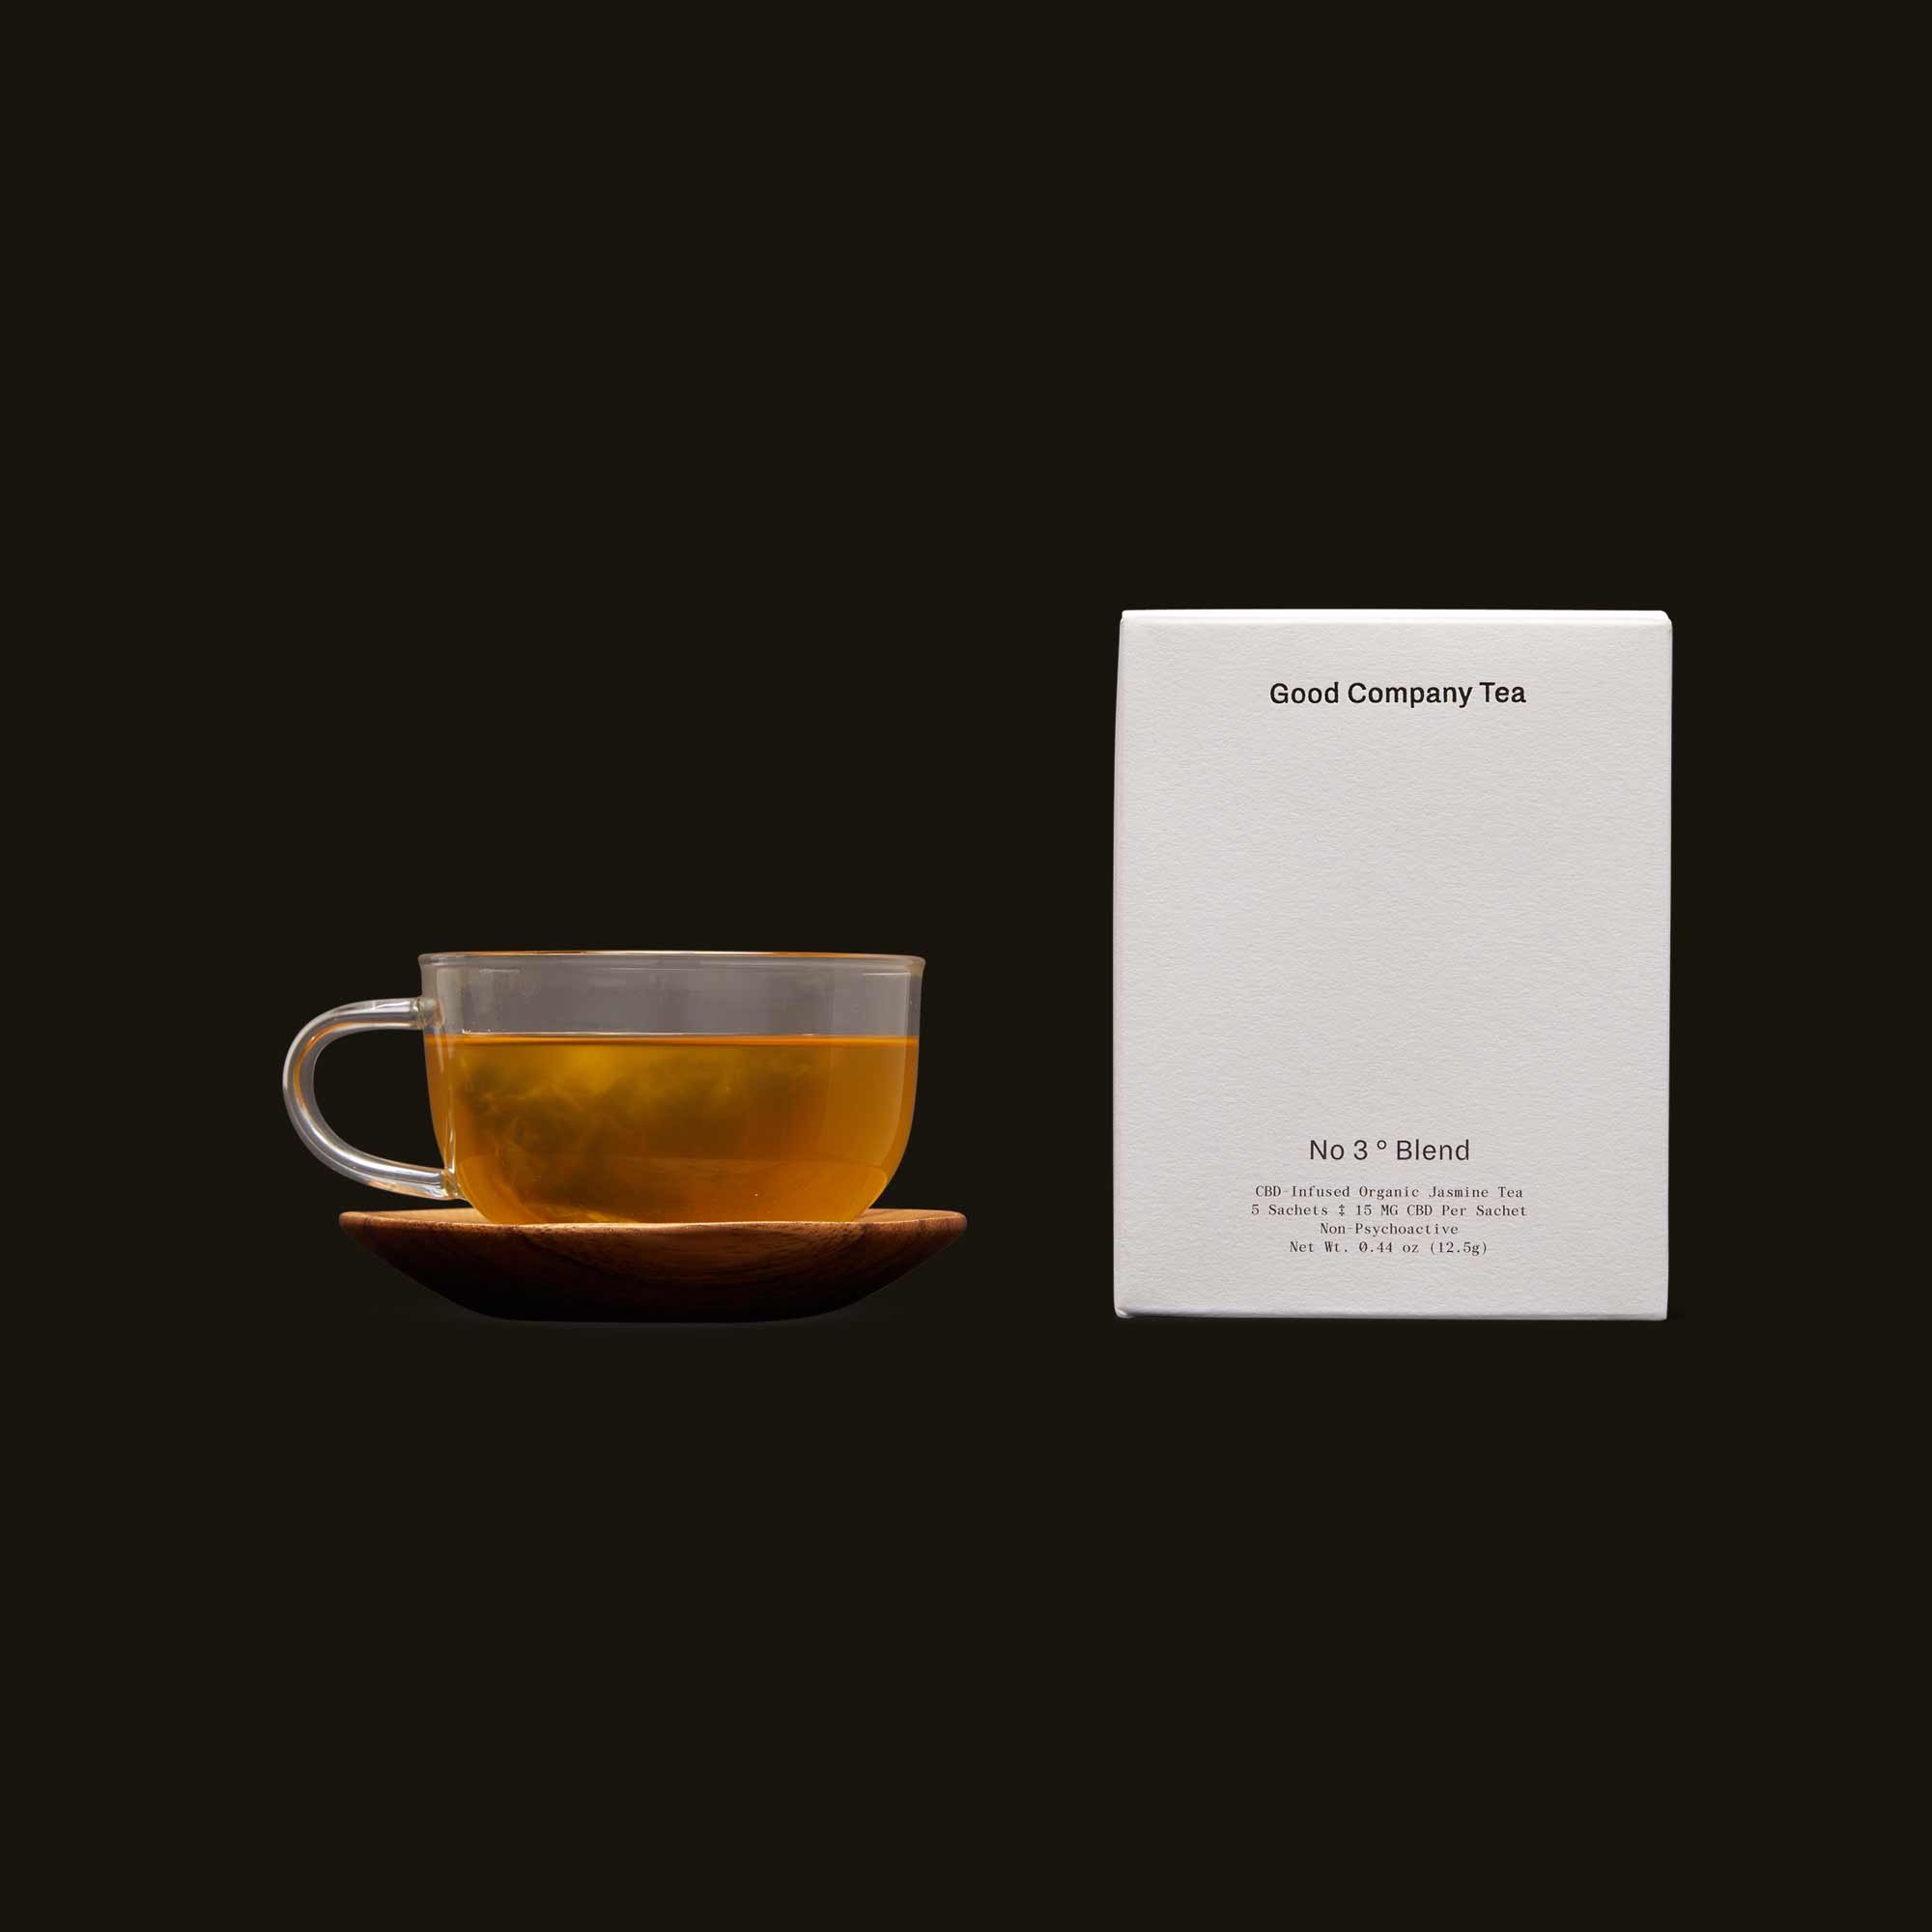 Good Company Tea No. 3 Nighttime Blend